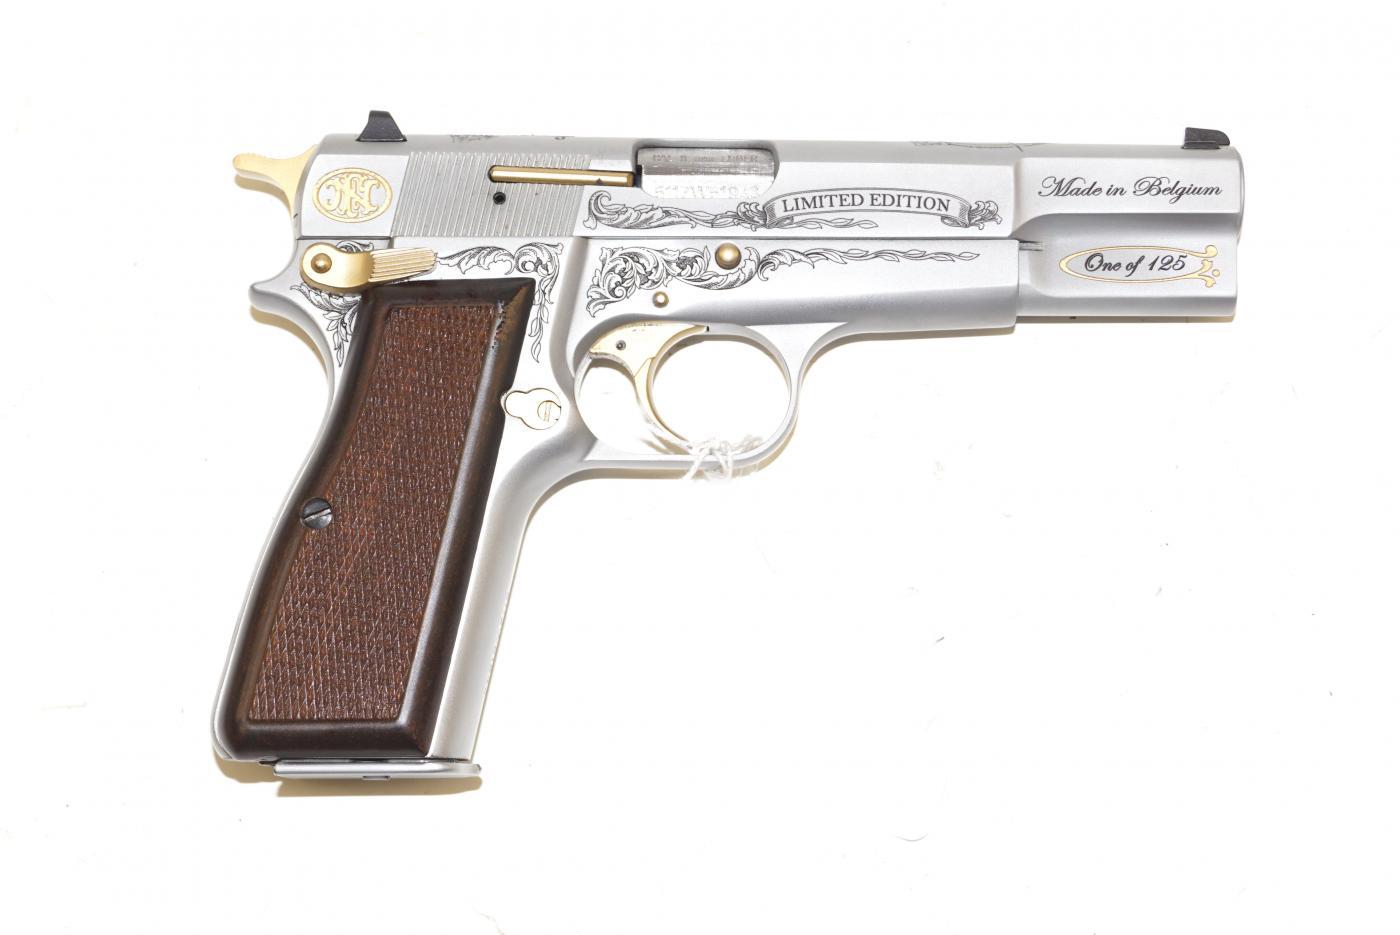 Le GP 35 plaqué or de Kadhafi 8780